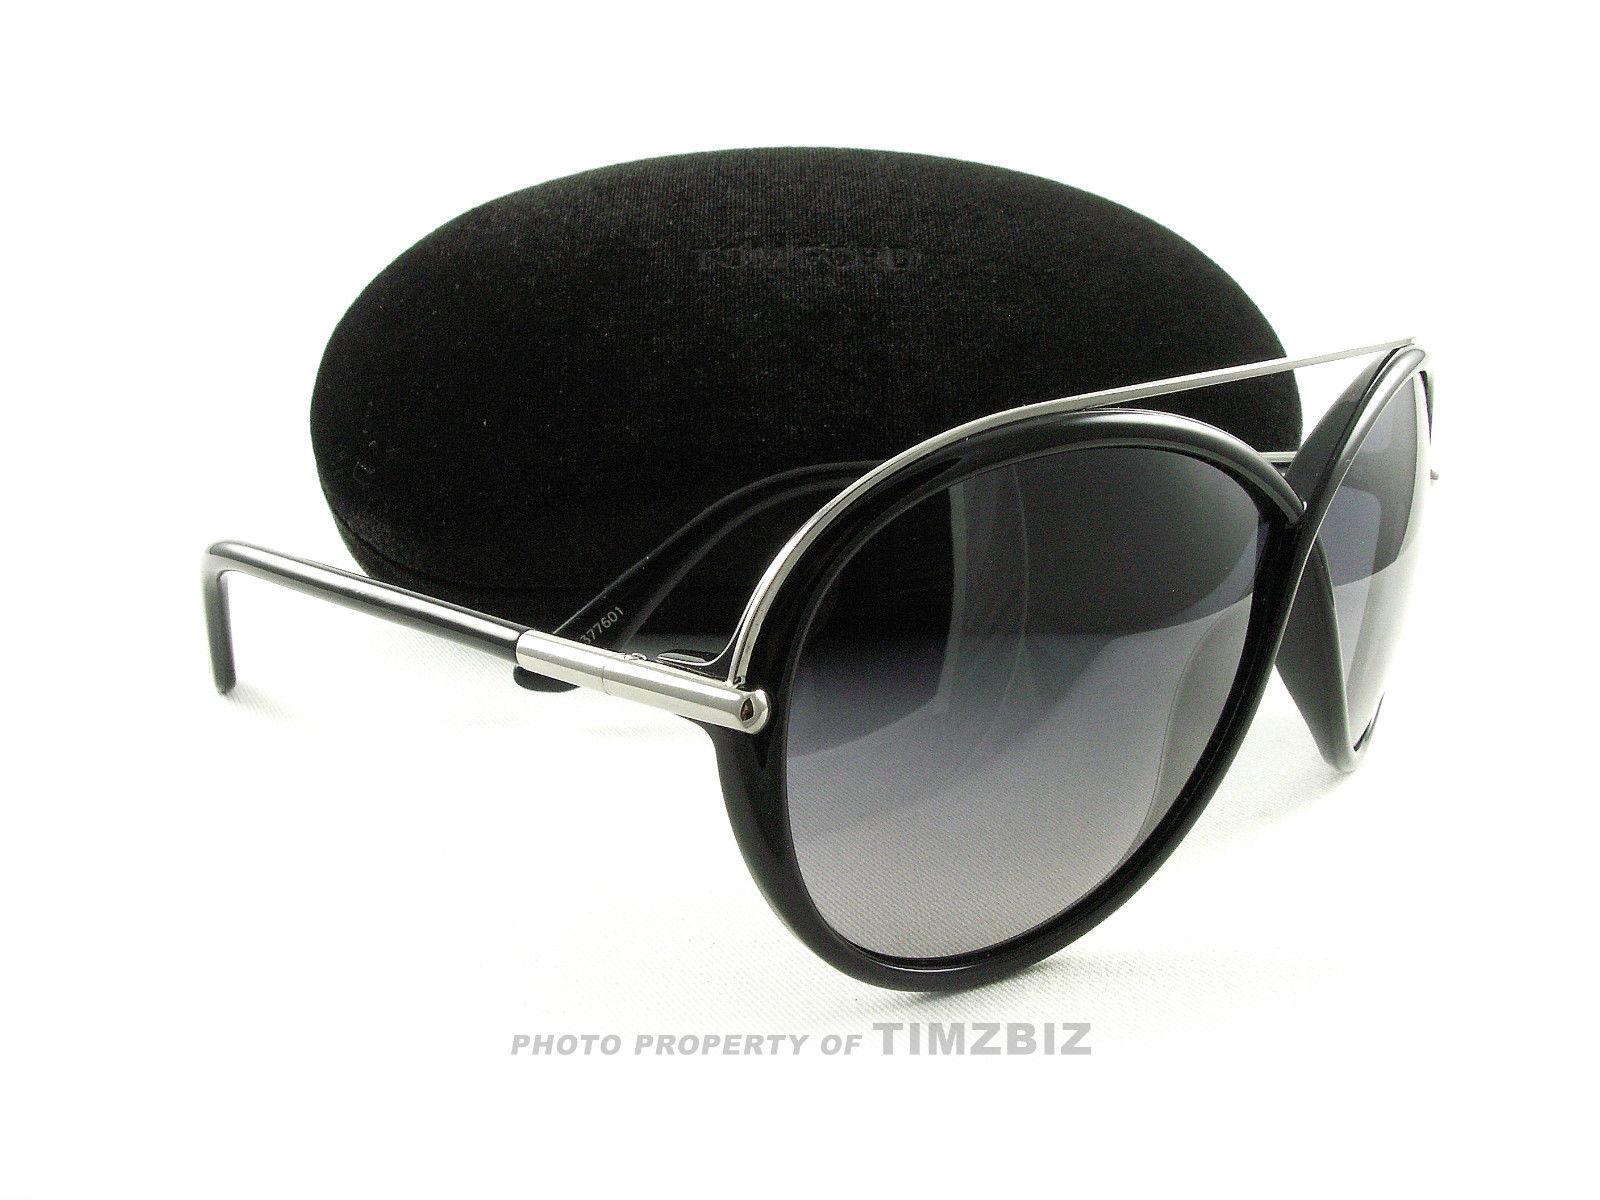 f434b3590e596 New Tom Ford Sunglasses TF454 S Tamara 01C and 50 similar items. 57